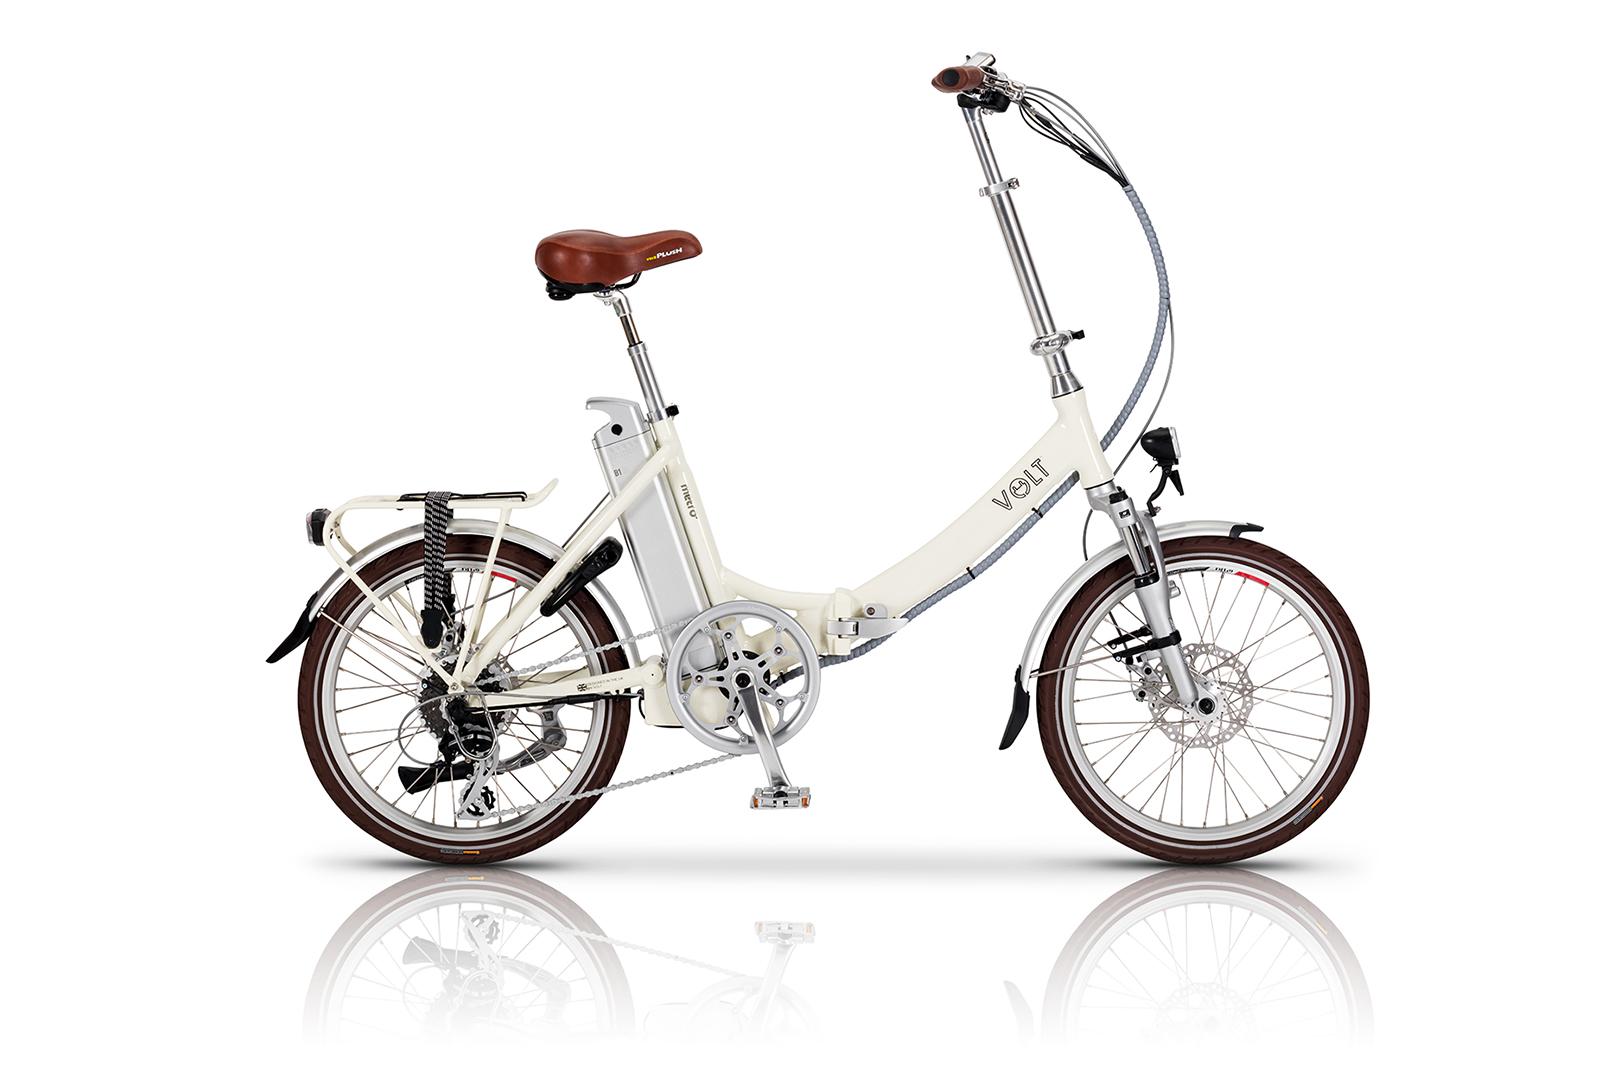 61dbcb4d5a8 Best Electric Bikes UK - Electric Bike Store